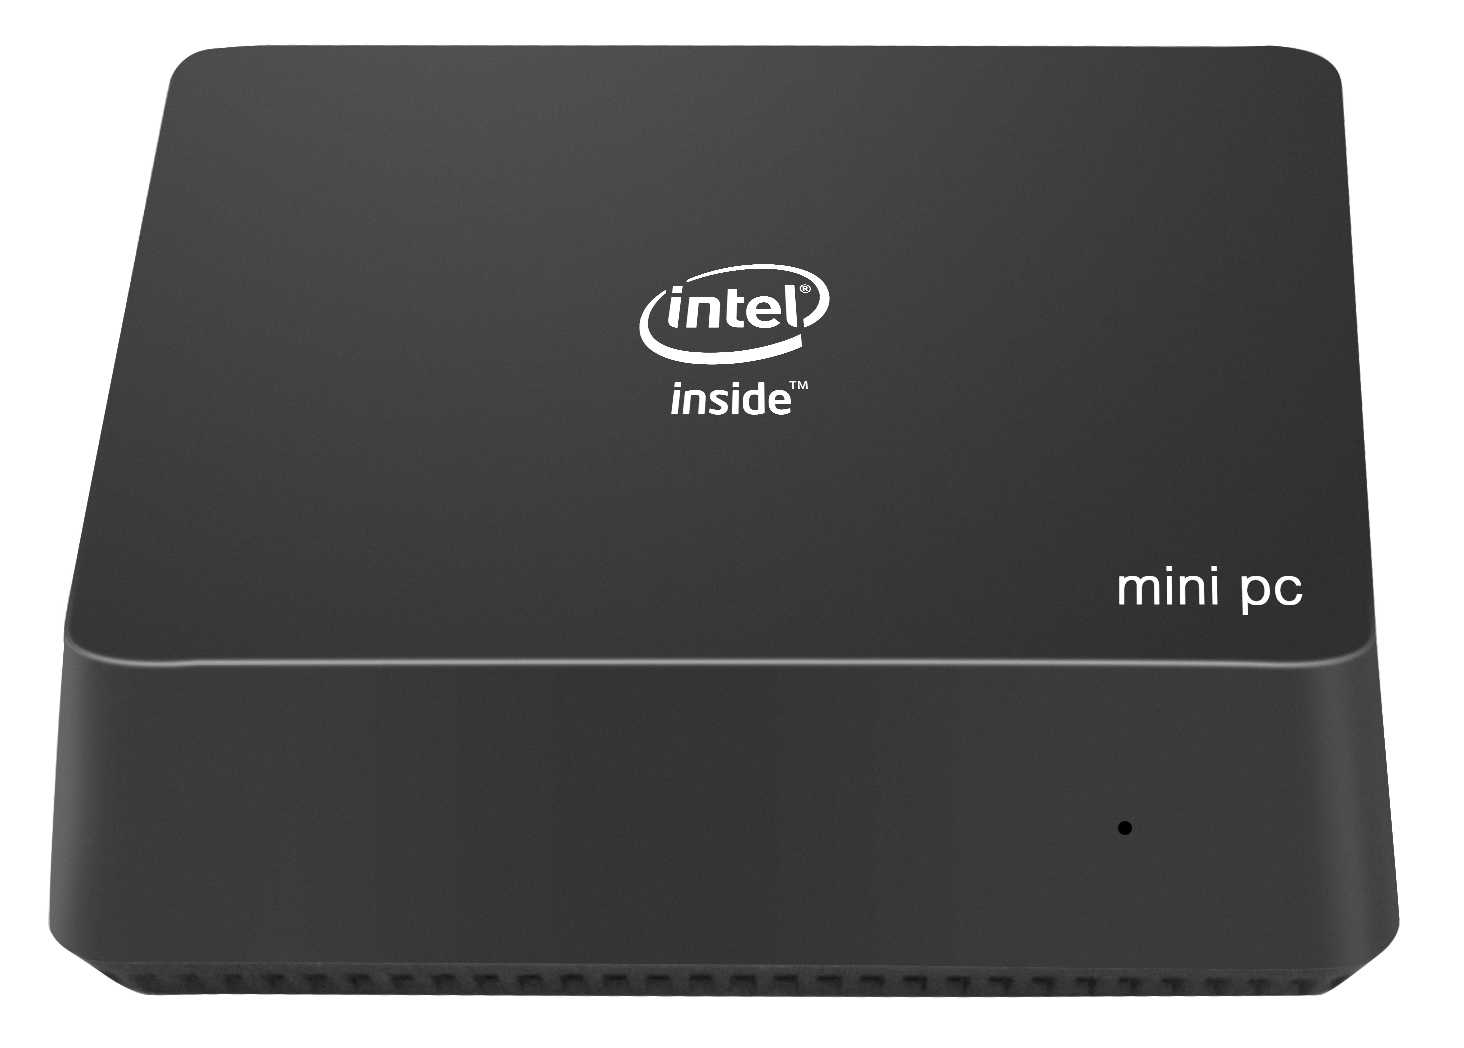 Hot Selling AK5 Mini PC 4G64G Intel Apollo Lake N3350/N3450 Dual Wifi HD Output SATA Support WiFi Voice Control USB 3.0 Win10